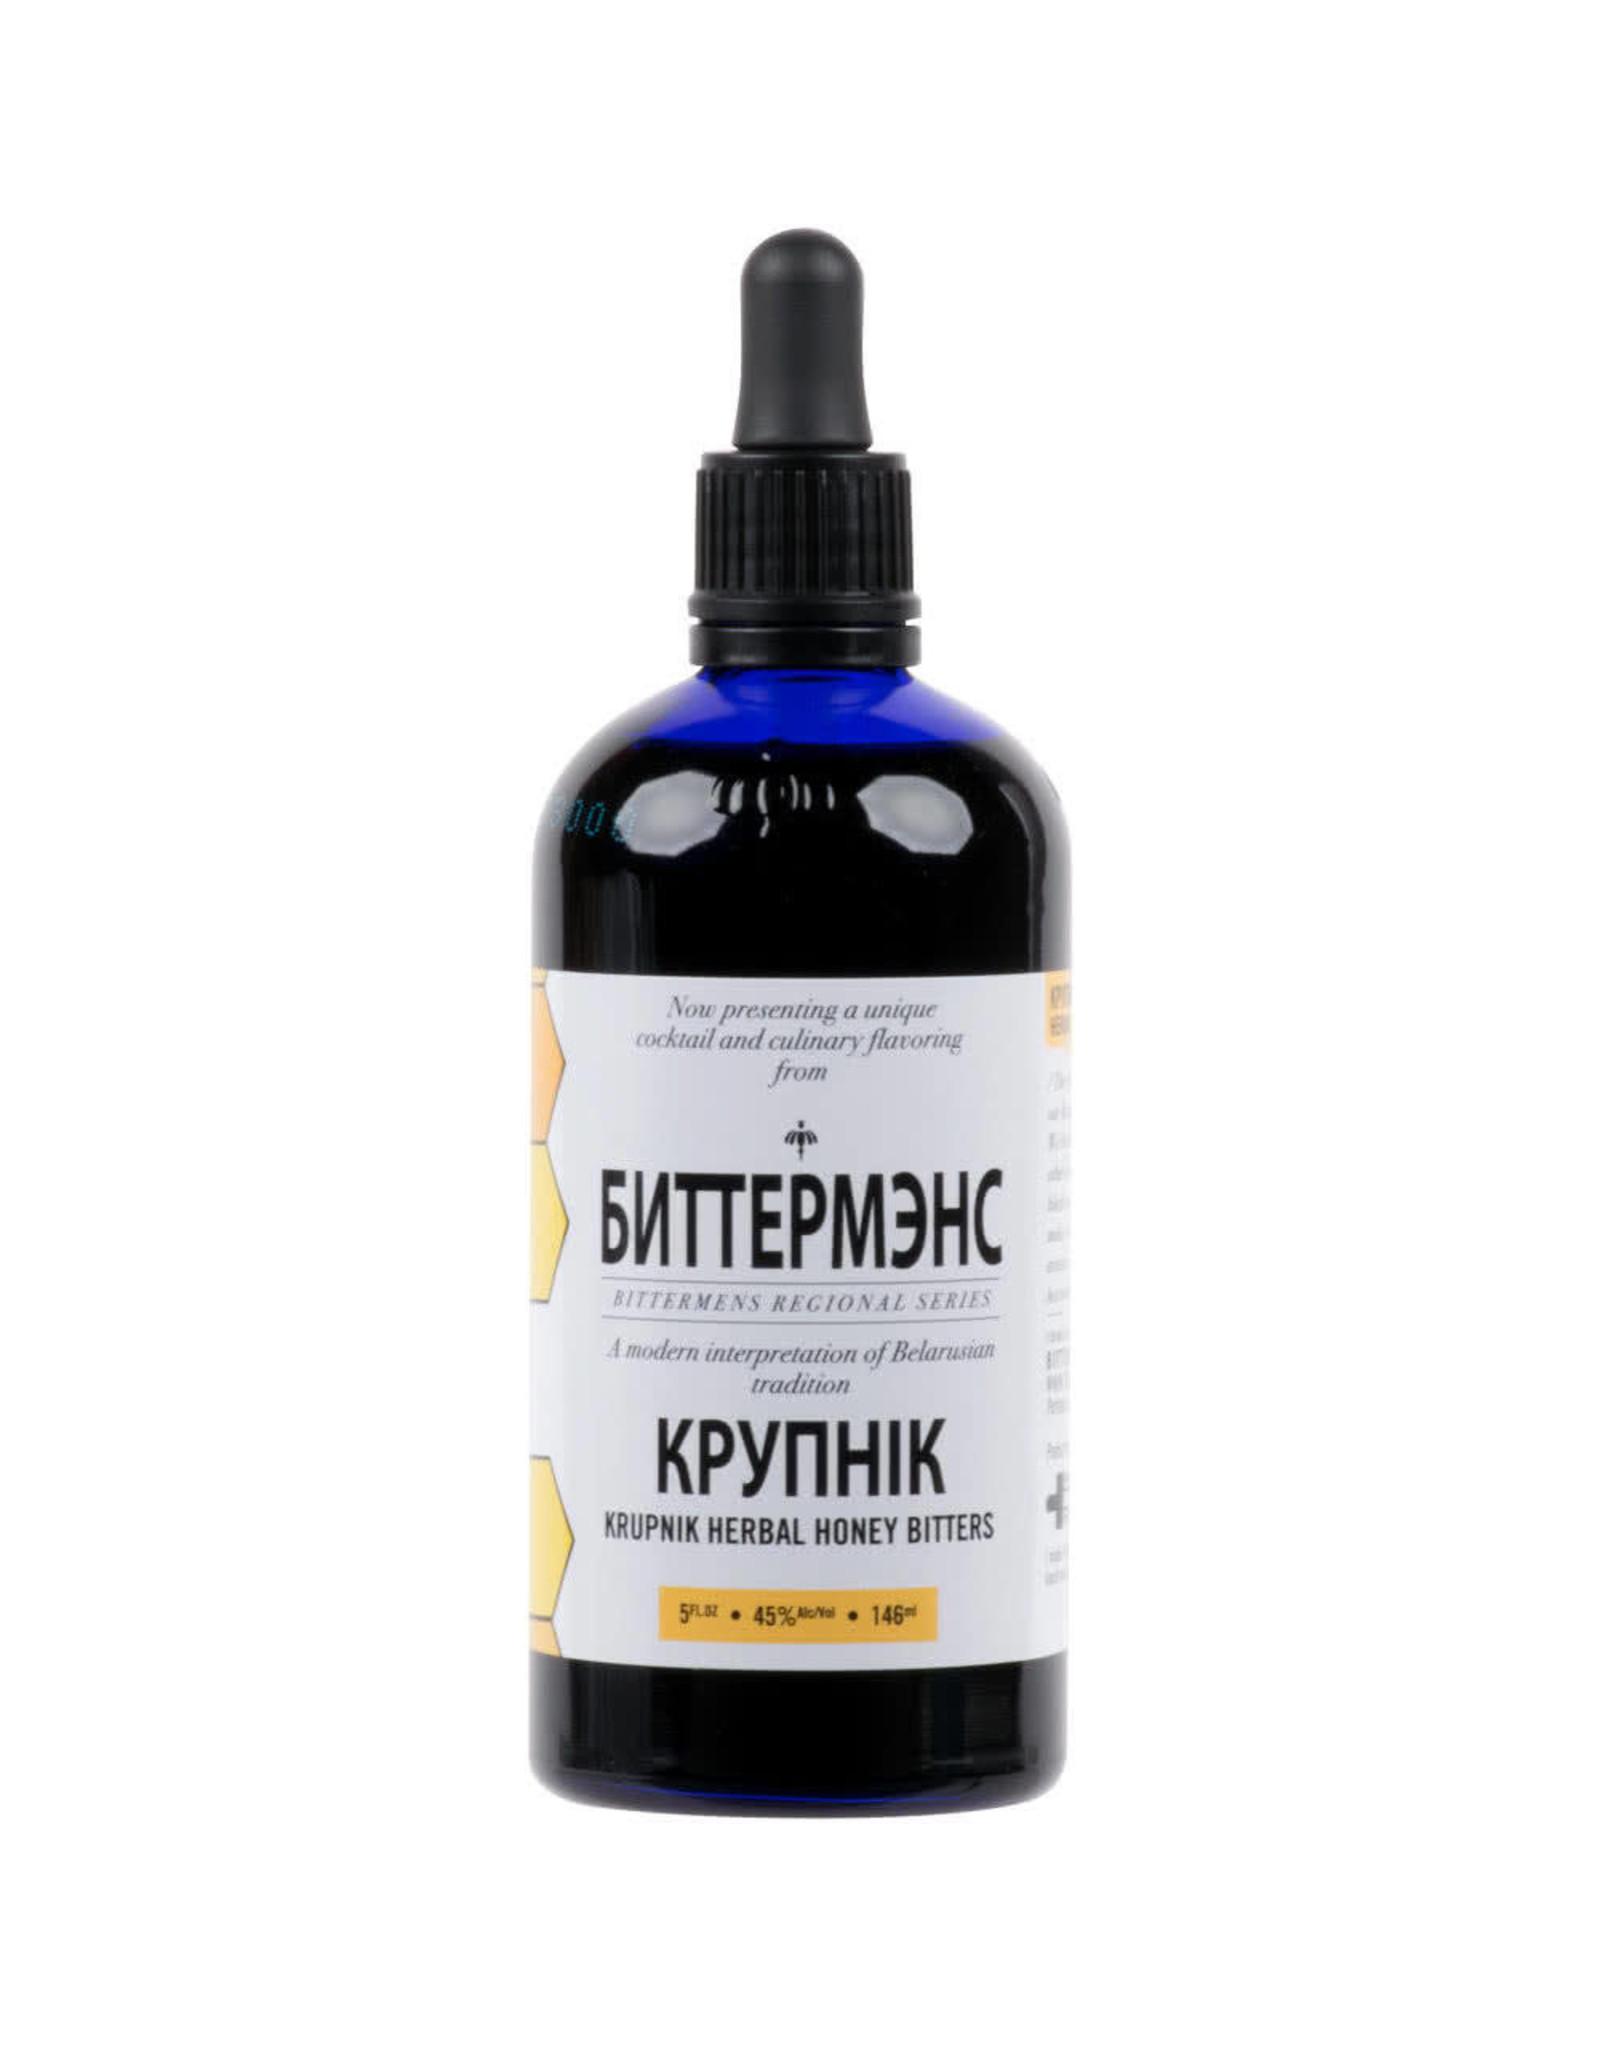 Bittermens Bittermens Krupnik Herbal Honey Bitters